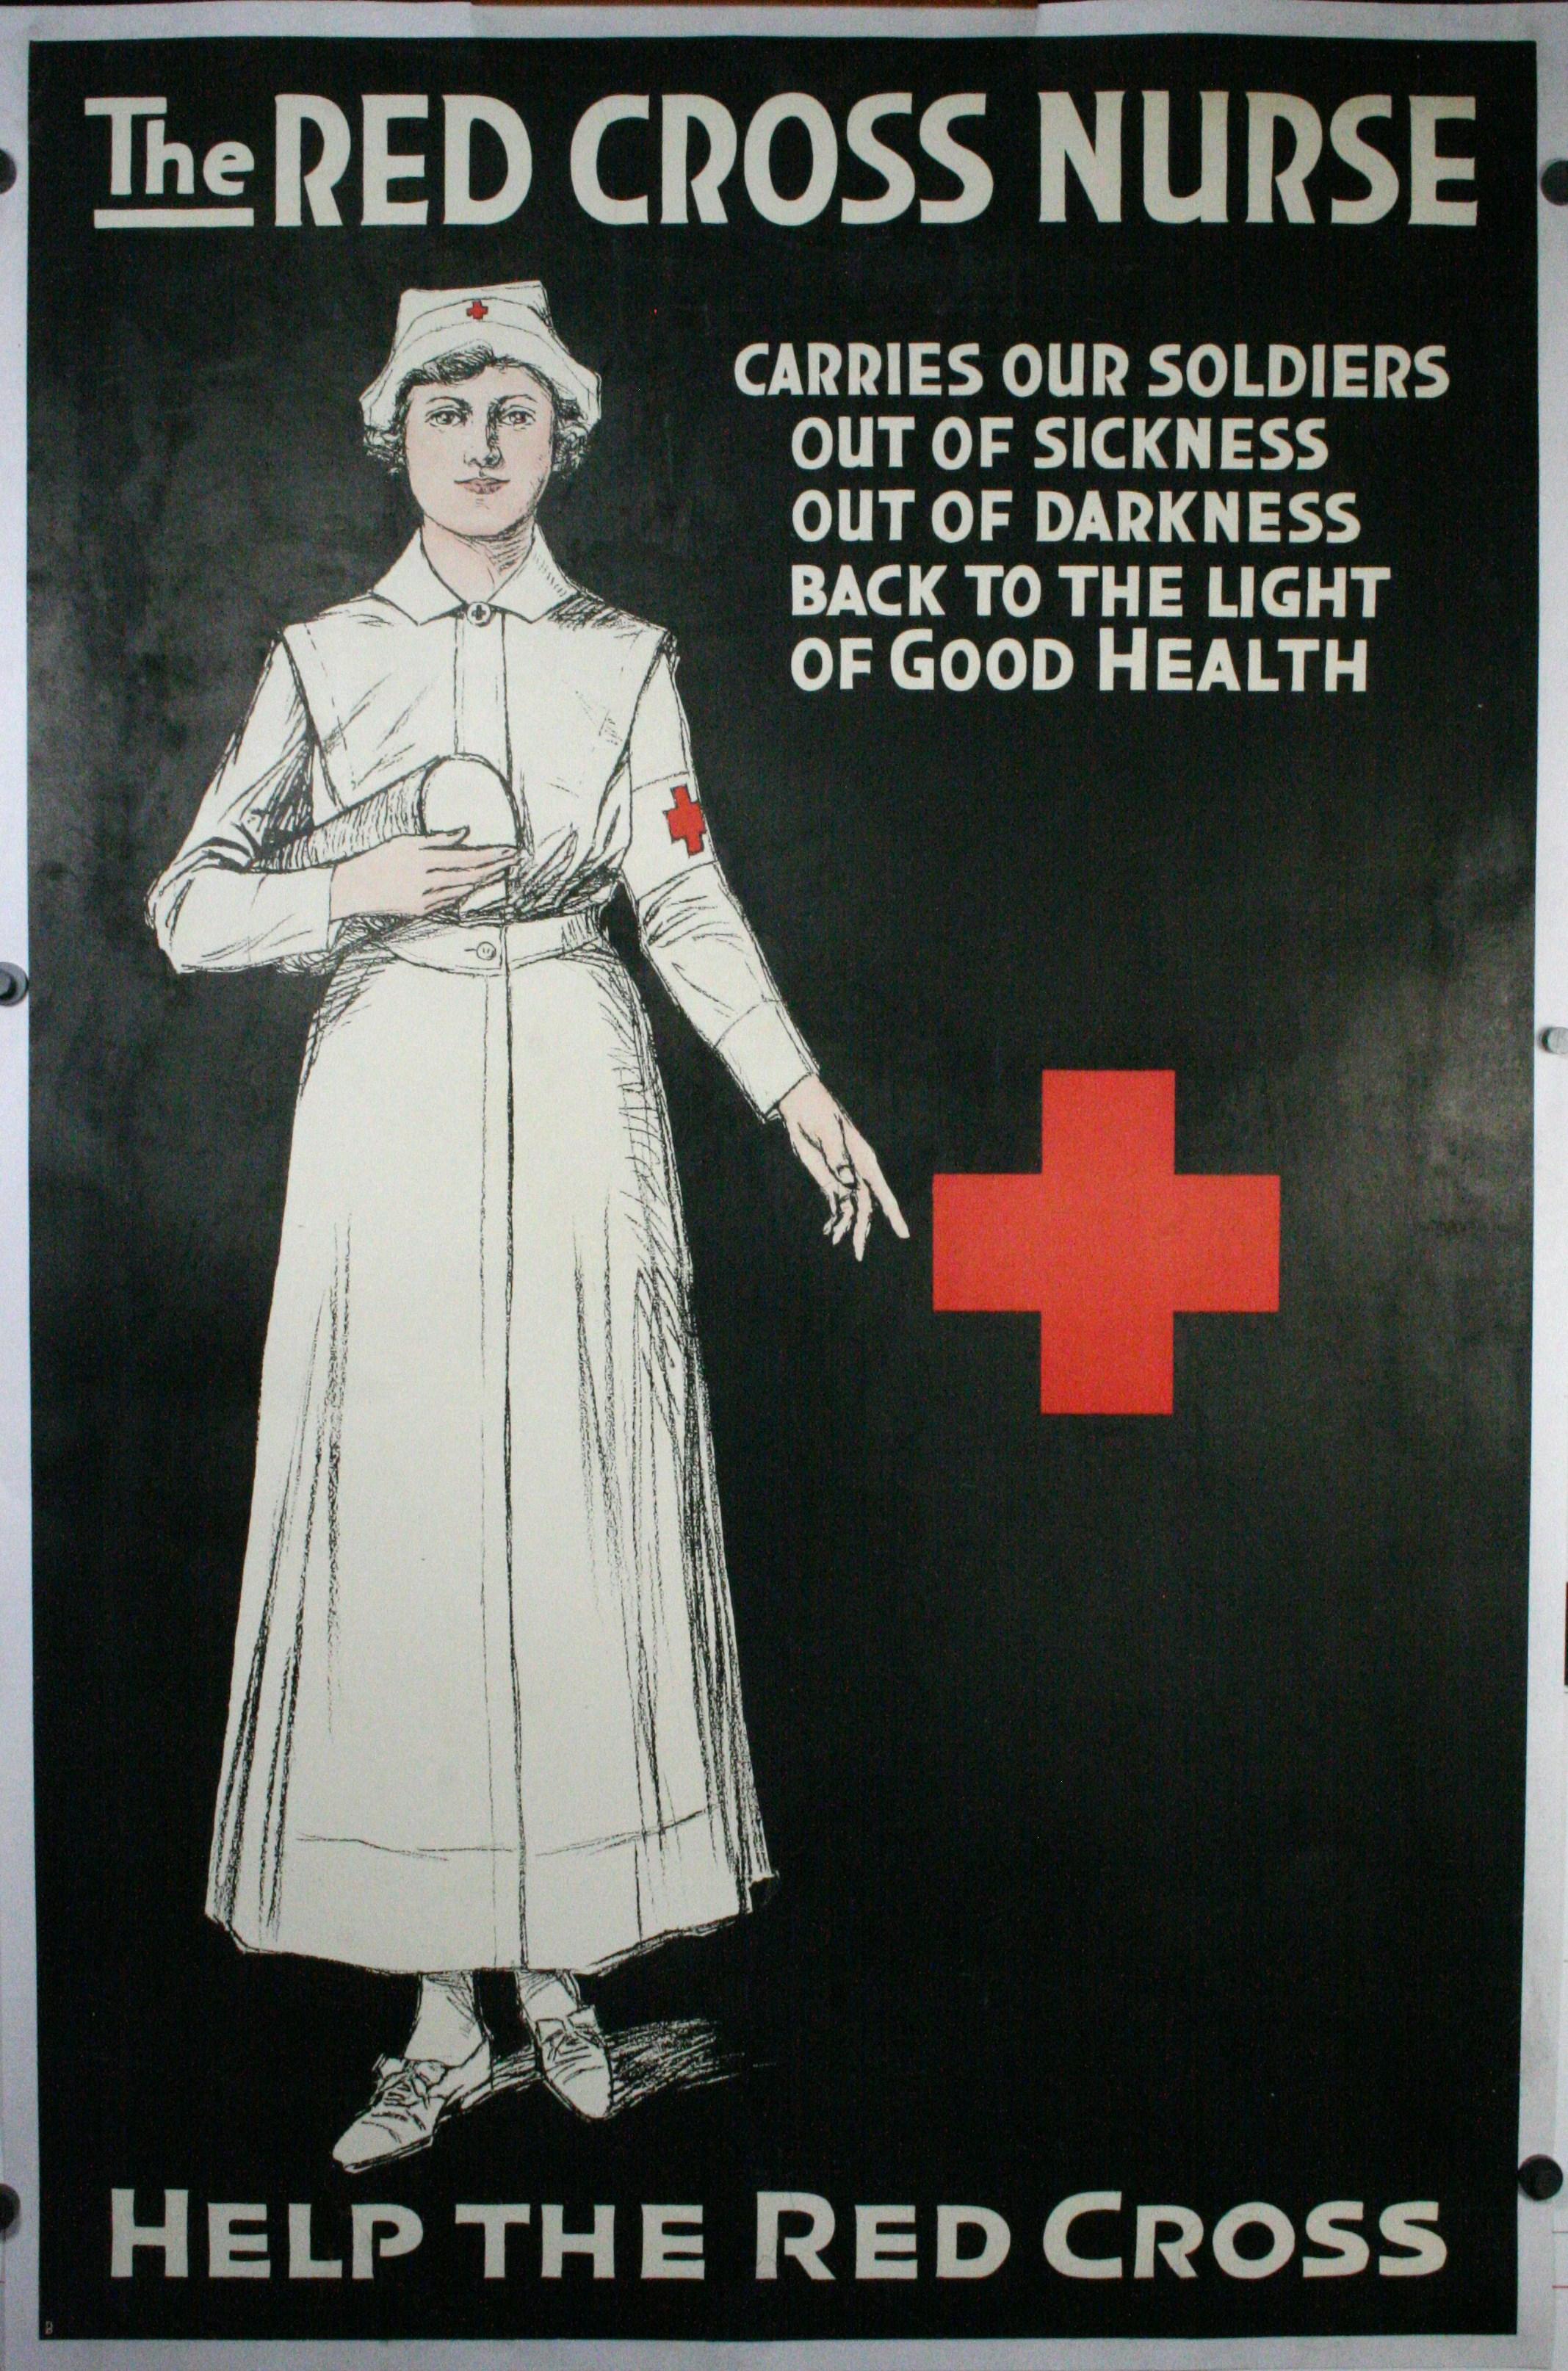 RED CROSS NURSE, An Original WW1 Propaganda Poster